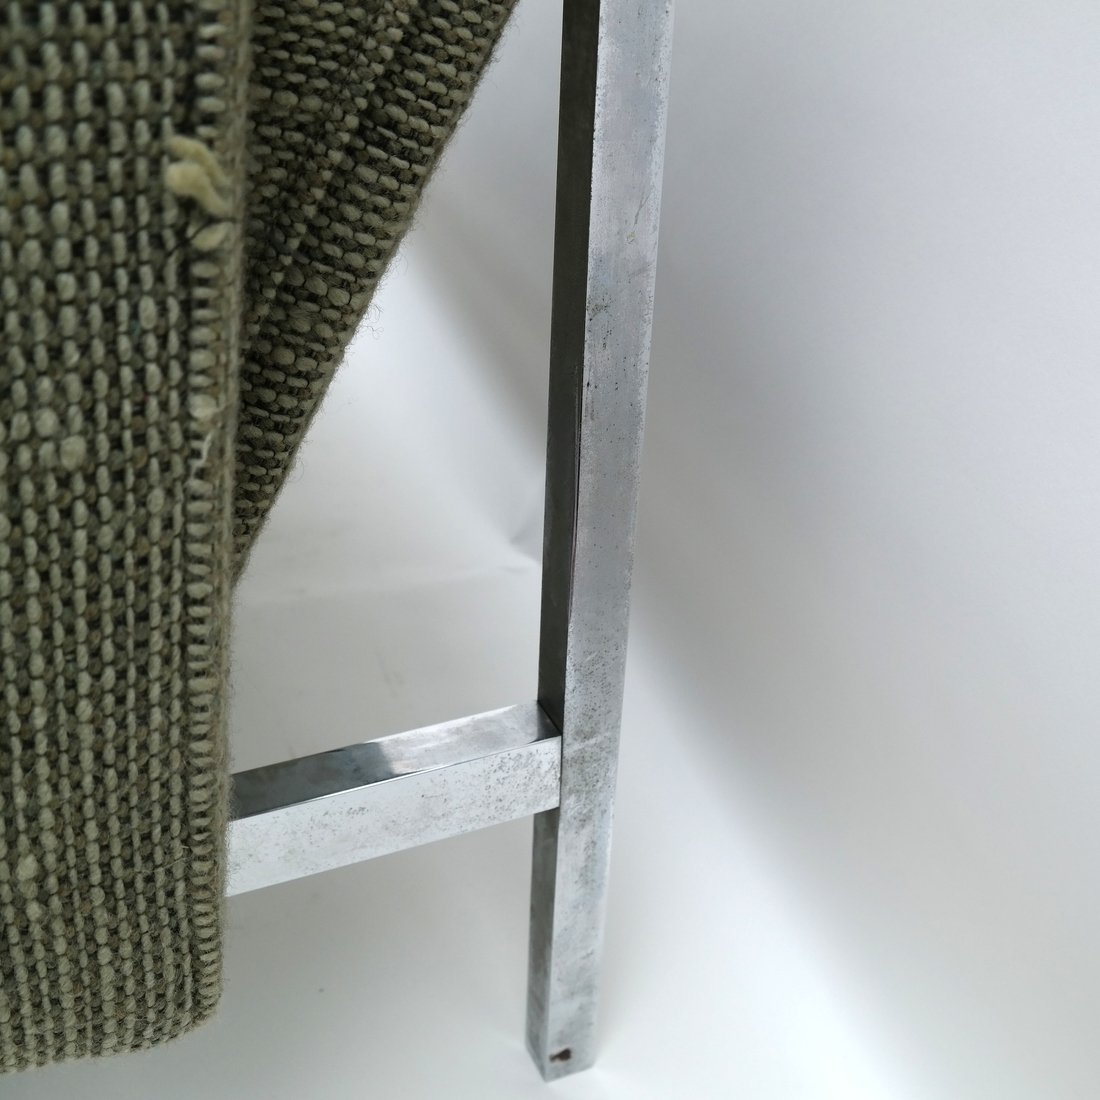 Knoll Green Upholstered Sofa - 10